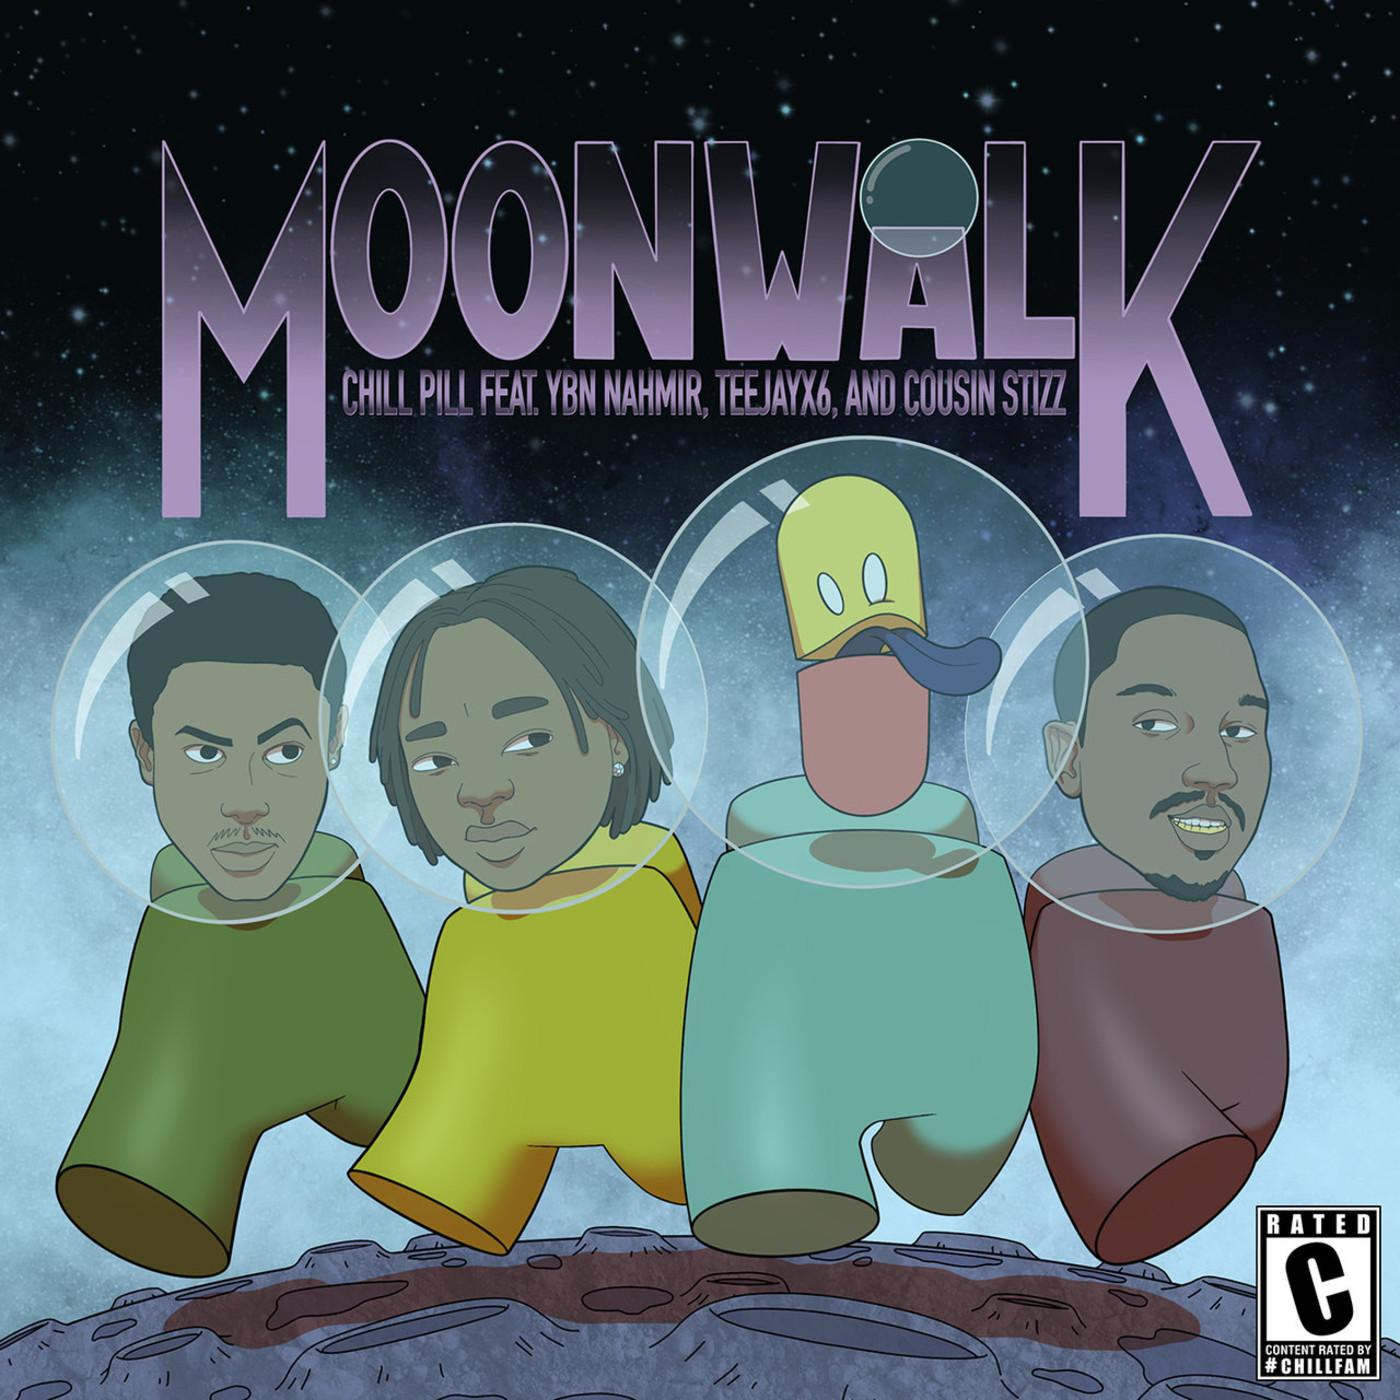 chillpill – Moonwalk (feat. YBN Nahmir, Teejayx6, & Cousin Stizz)